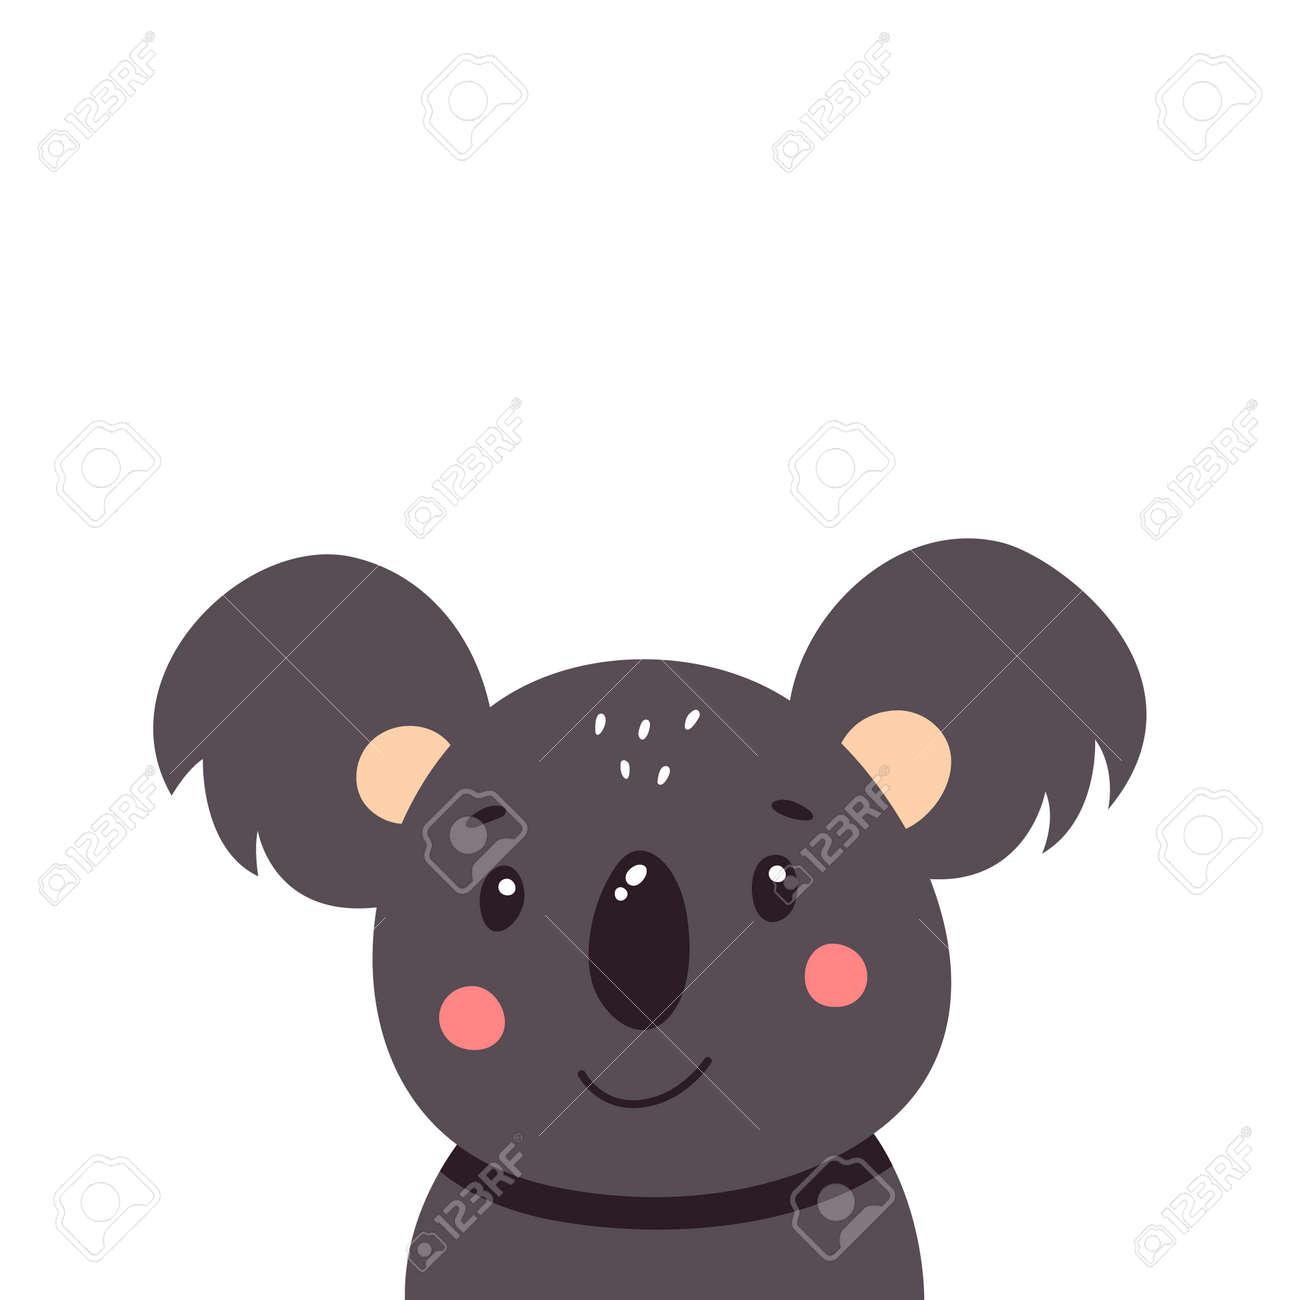 Cute koala. Vector illustration isolated on white background. - 169771670